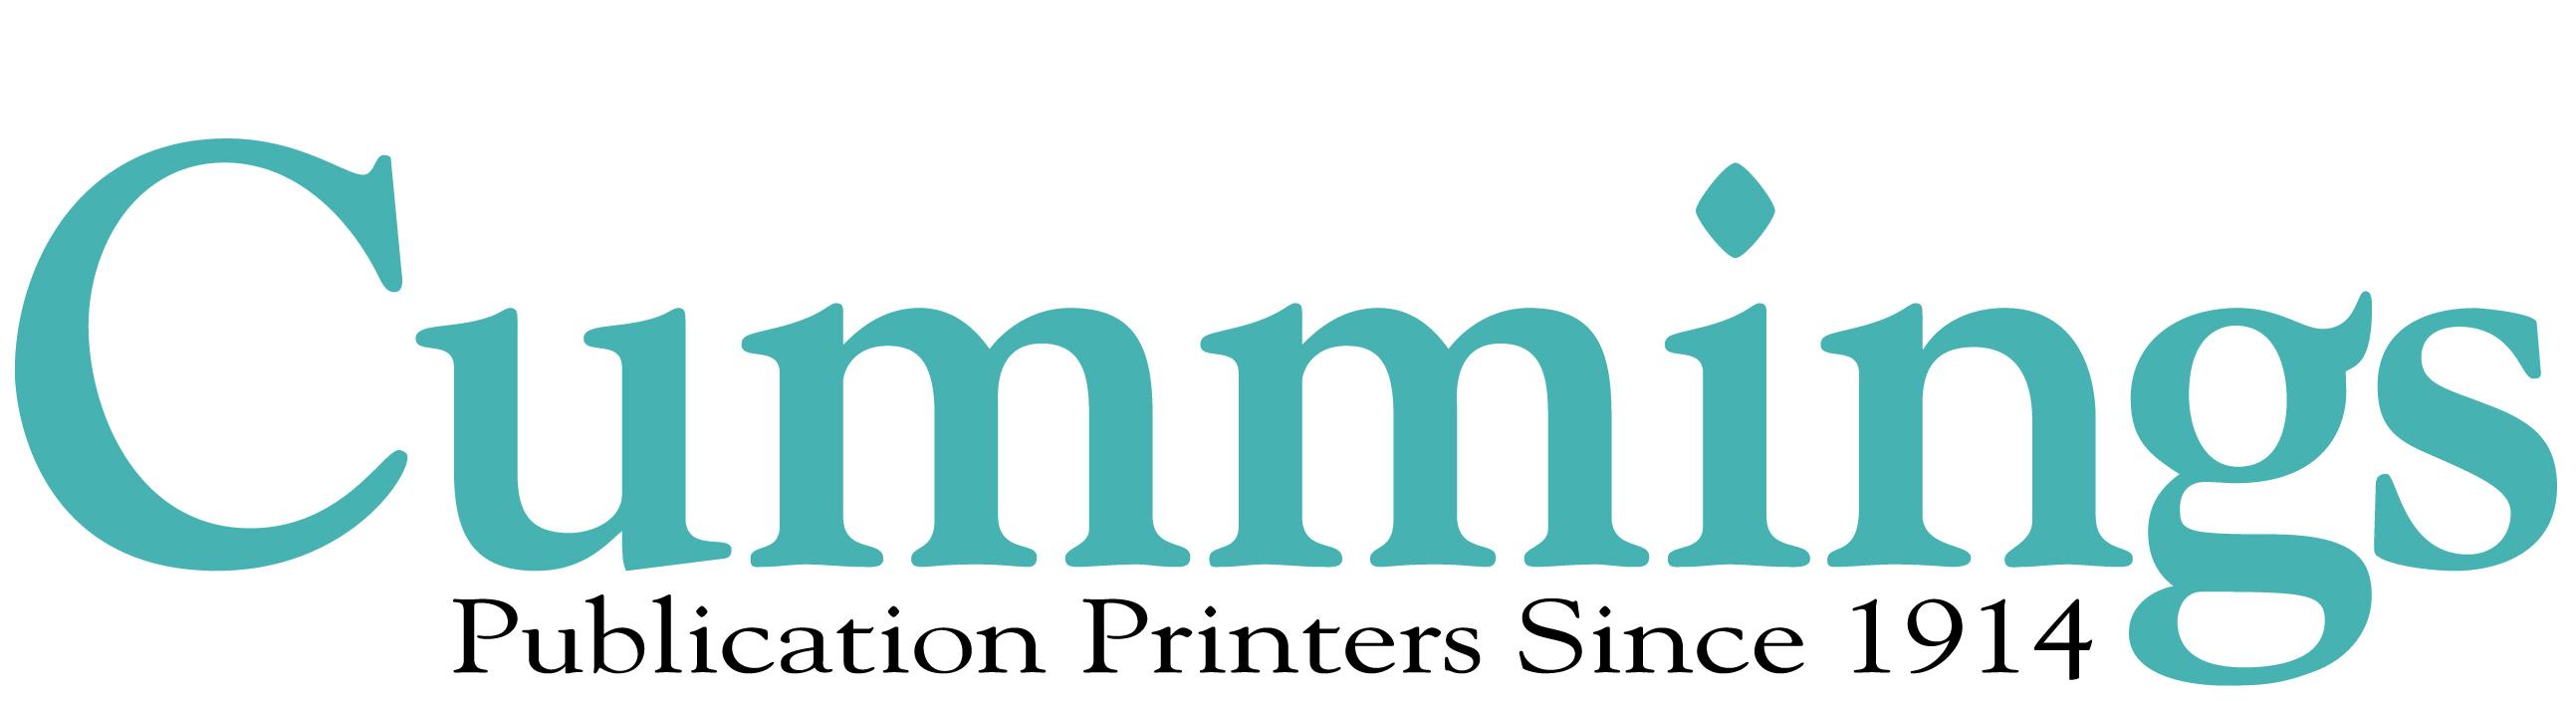 Cummings Printing – Silver Sponsor